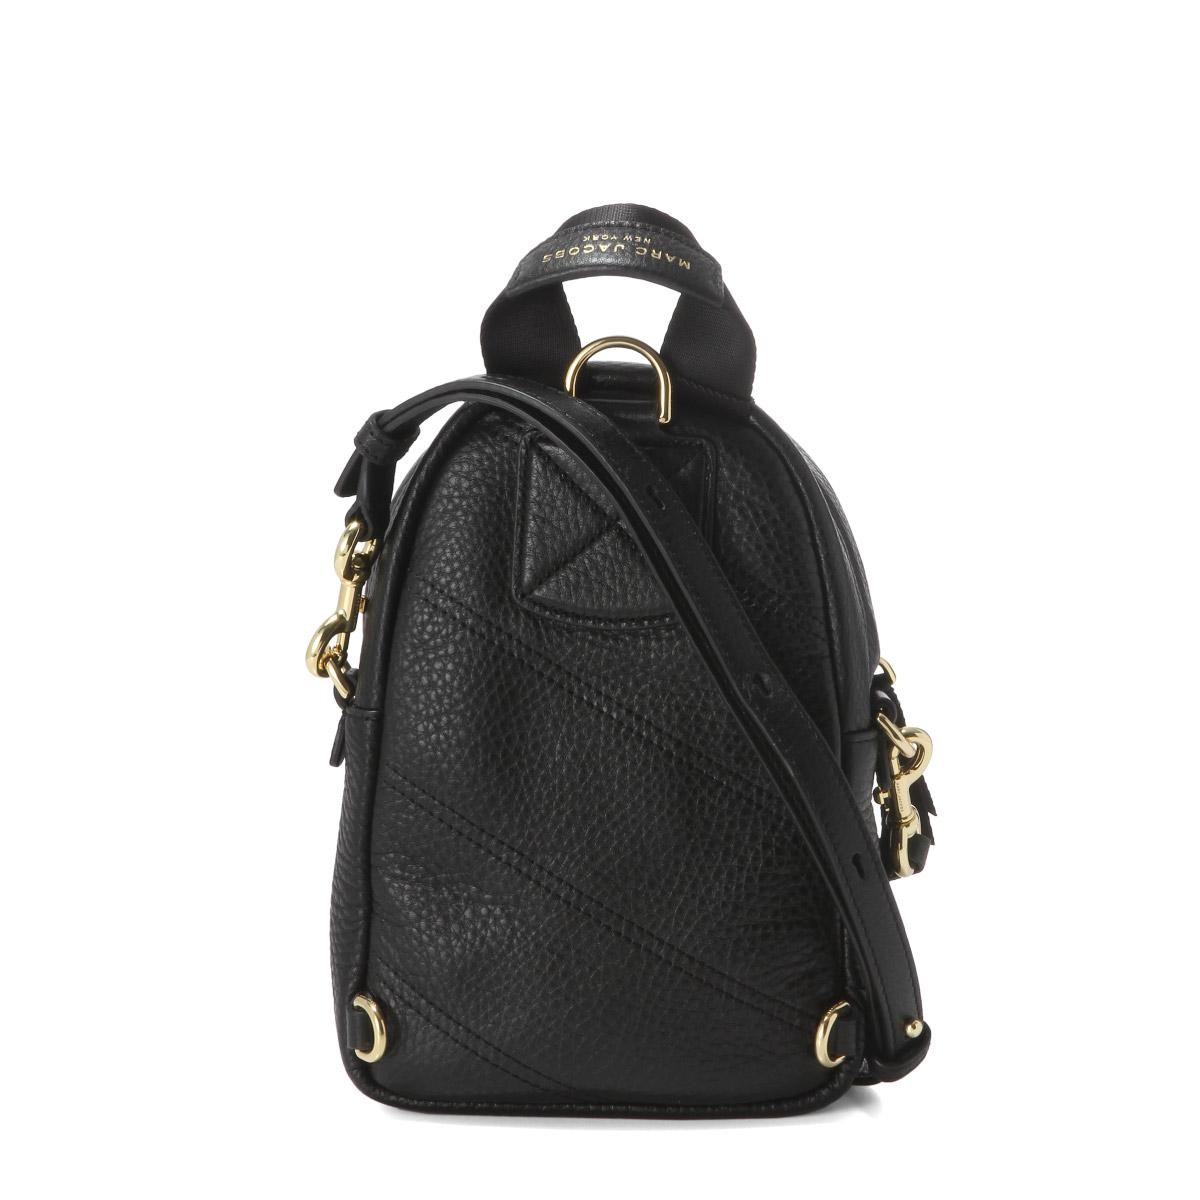 professional website hot-selling latest best authentic Mark Jacobs MARC JACOBS bag lady M0014269 001 shoulder backpack micro TREK  PACK trek pack BLACK black belonging to